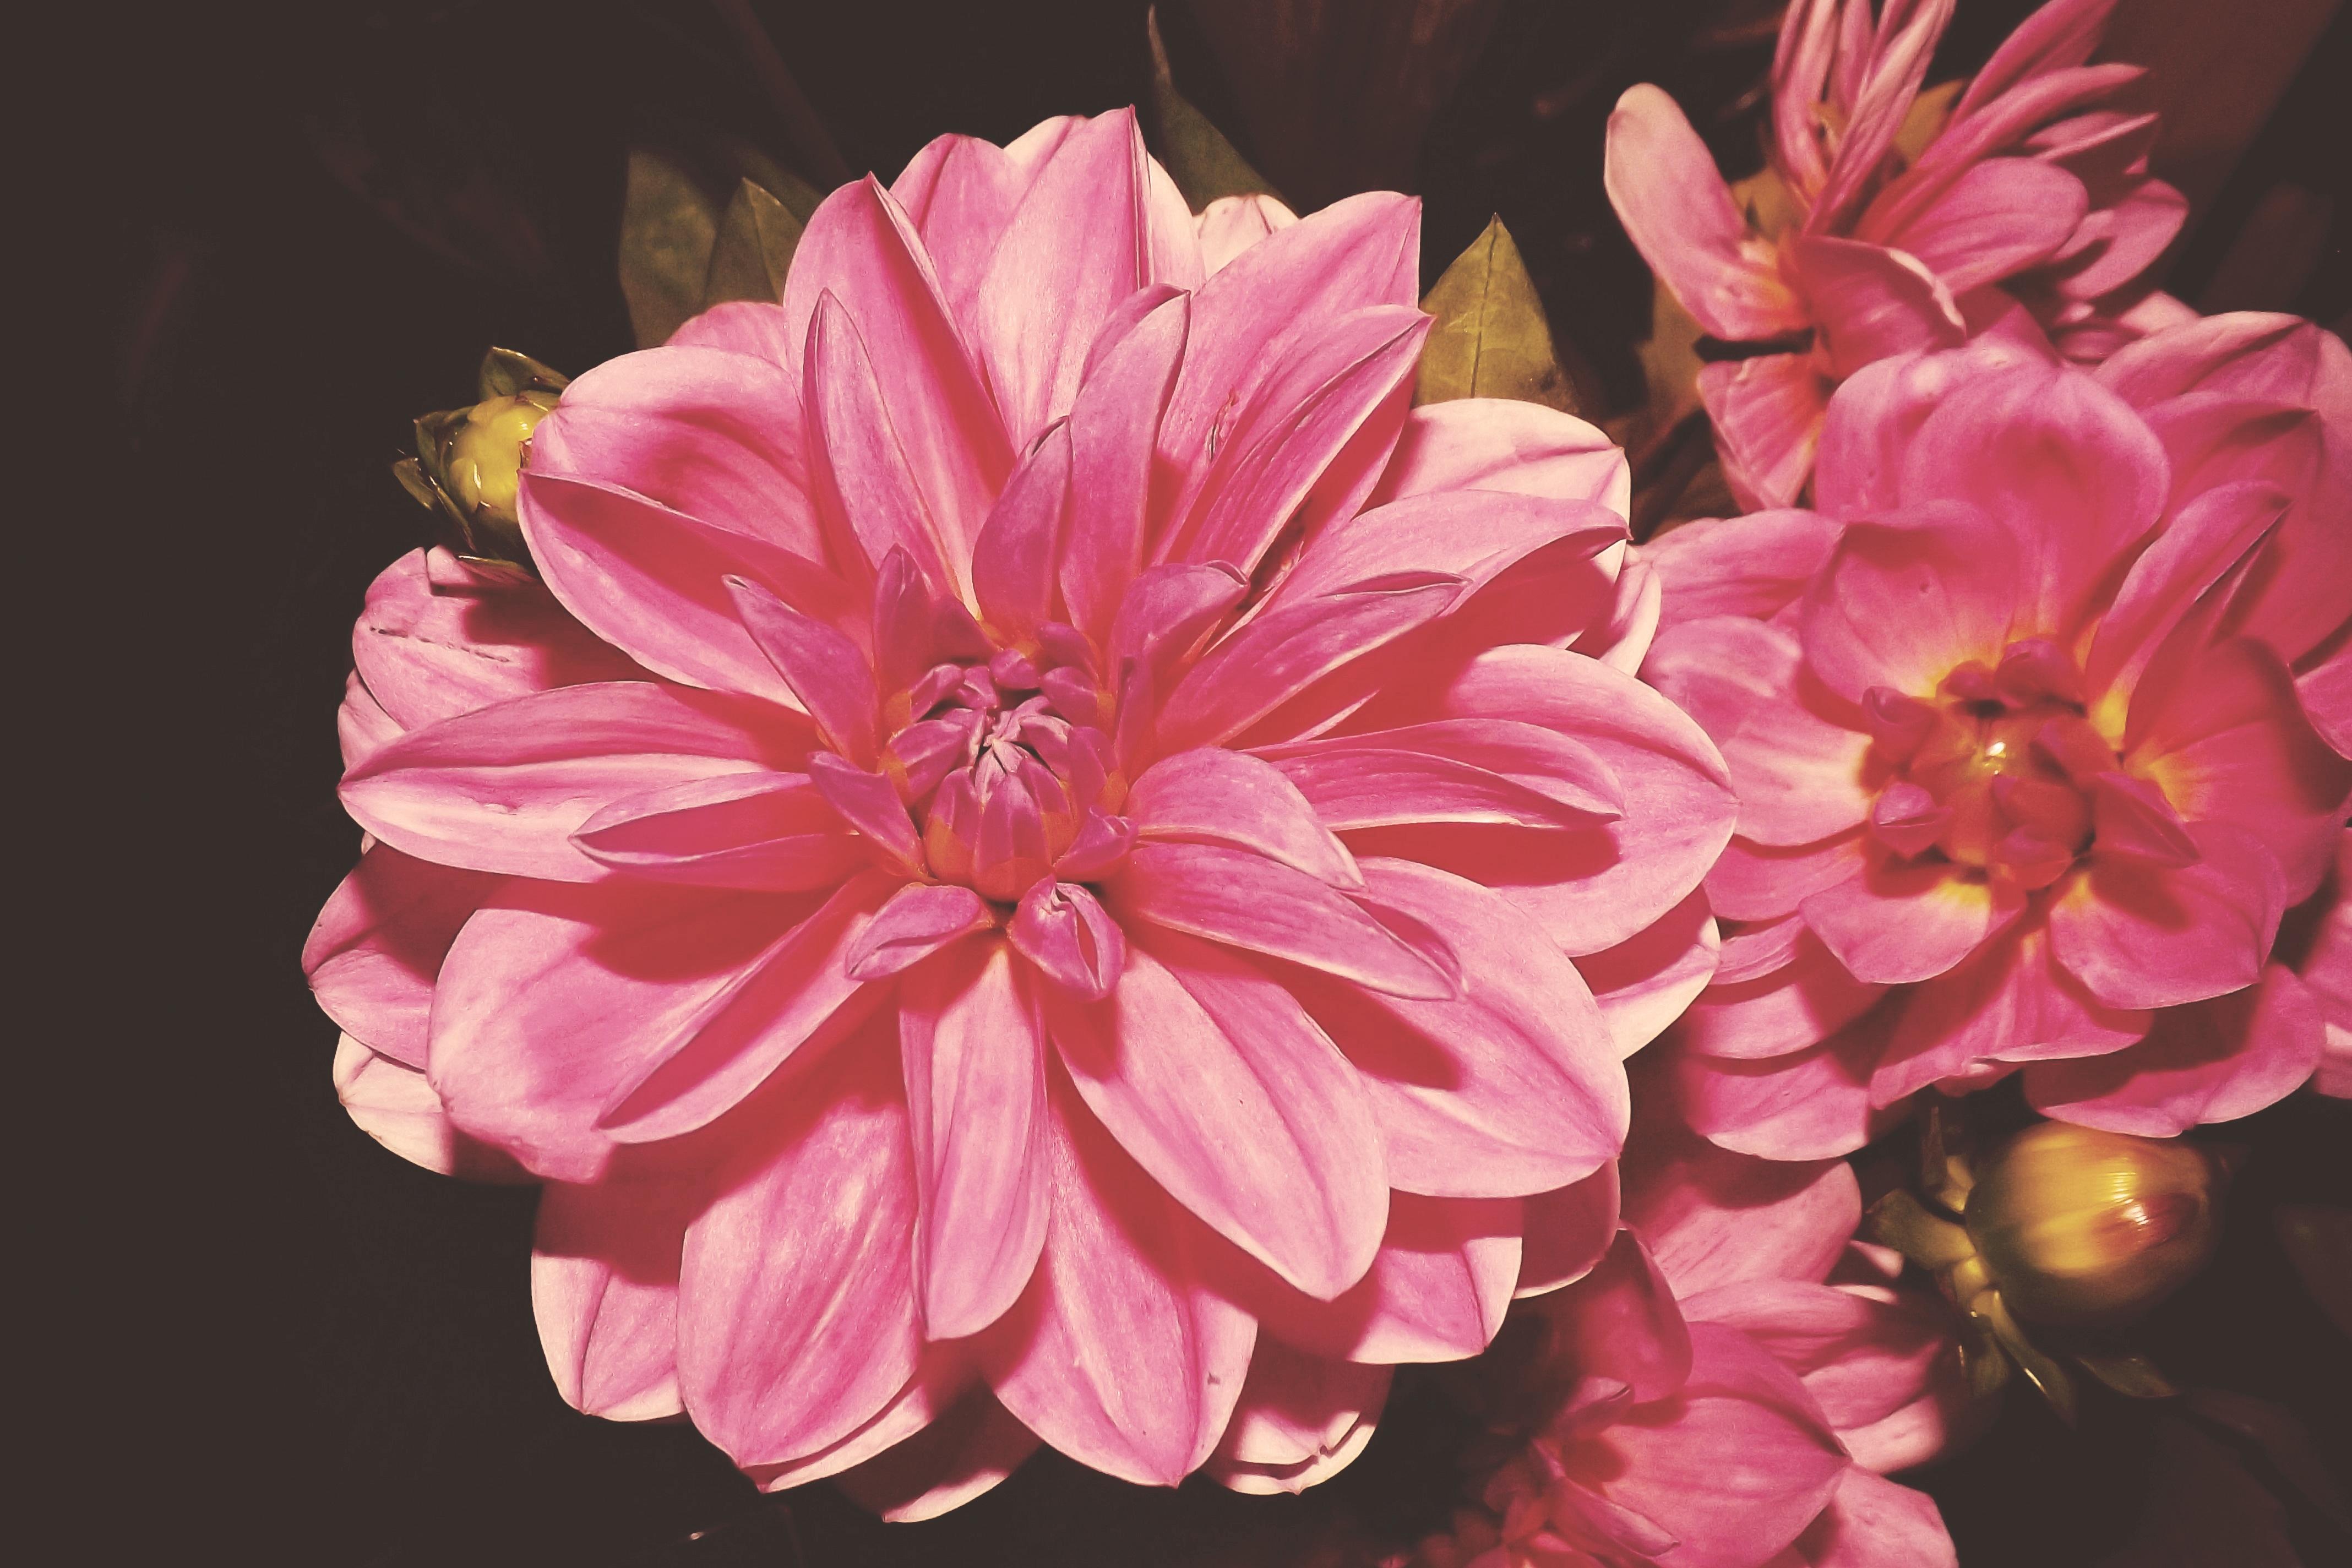 Free images blossom vintage retro flower petal bloom pink blossom plant vintage retro flower petal bloom pink flora flowers dahlia shabby dahlias floristry macro photography izmirmasajfo